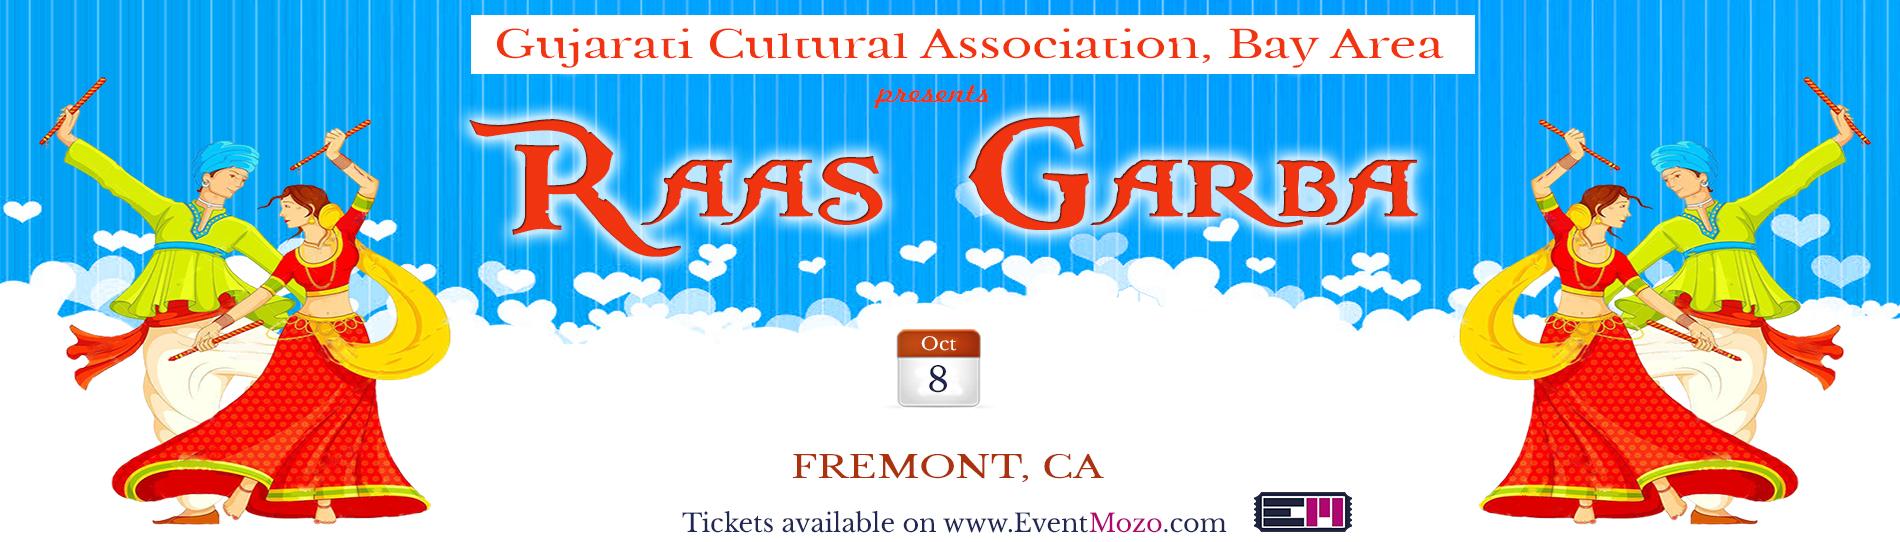 EventMozo GCA Bay Area Raas Garba 2016